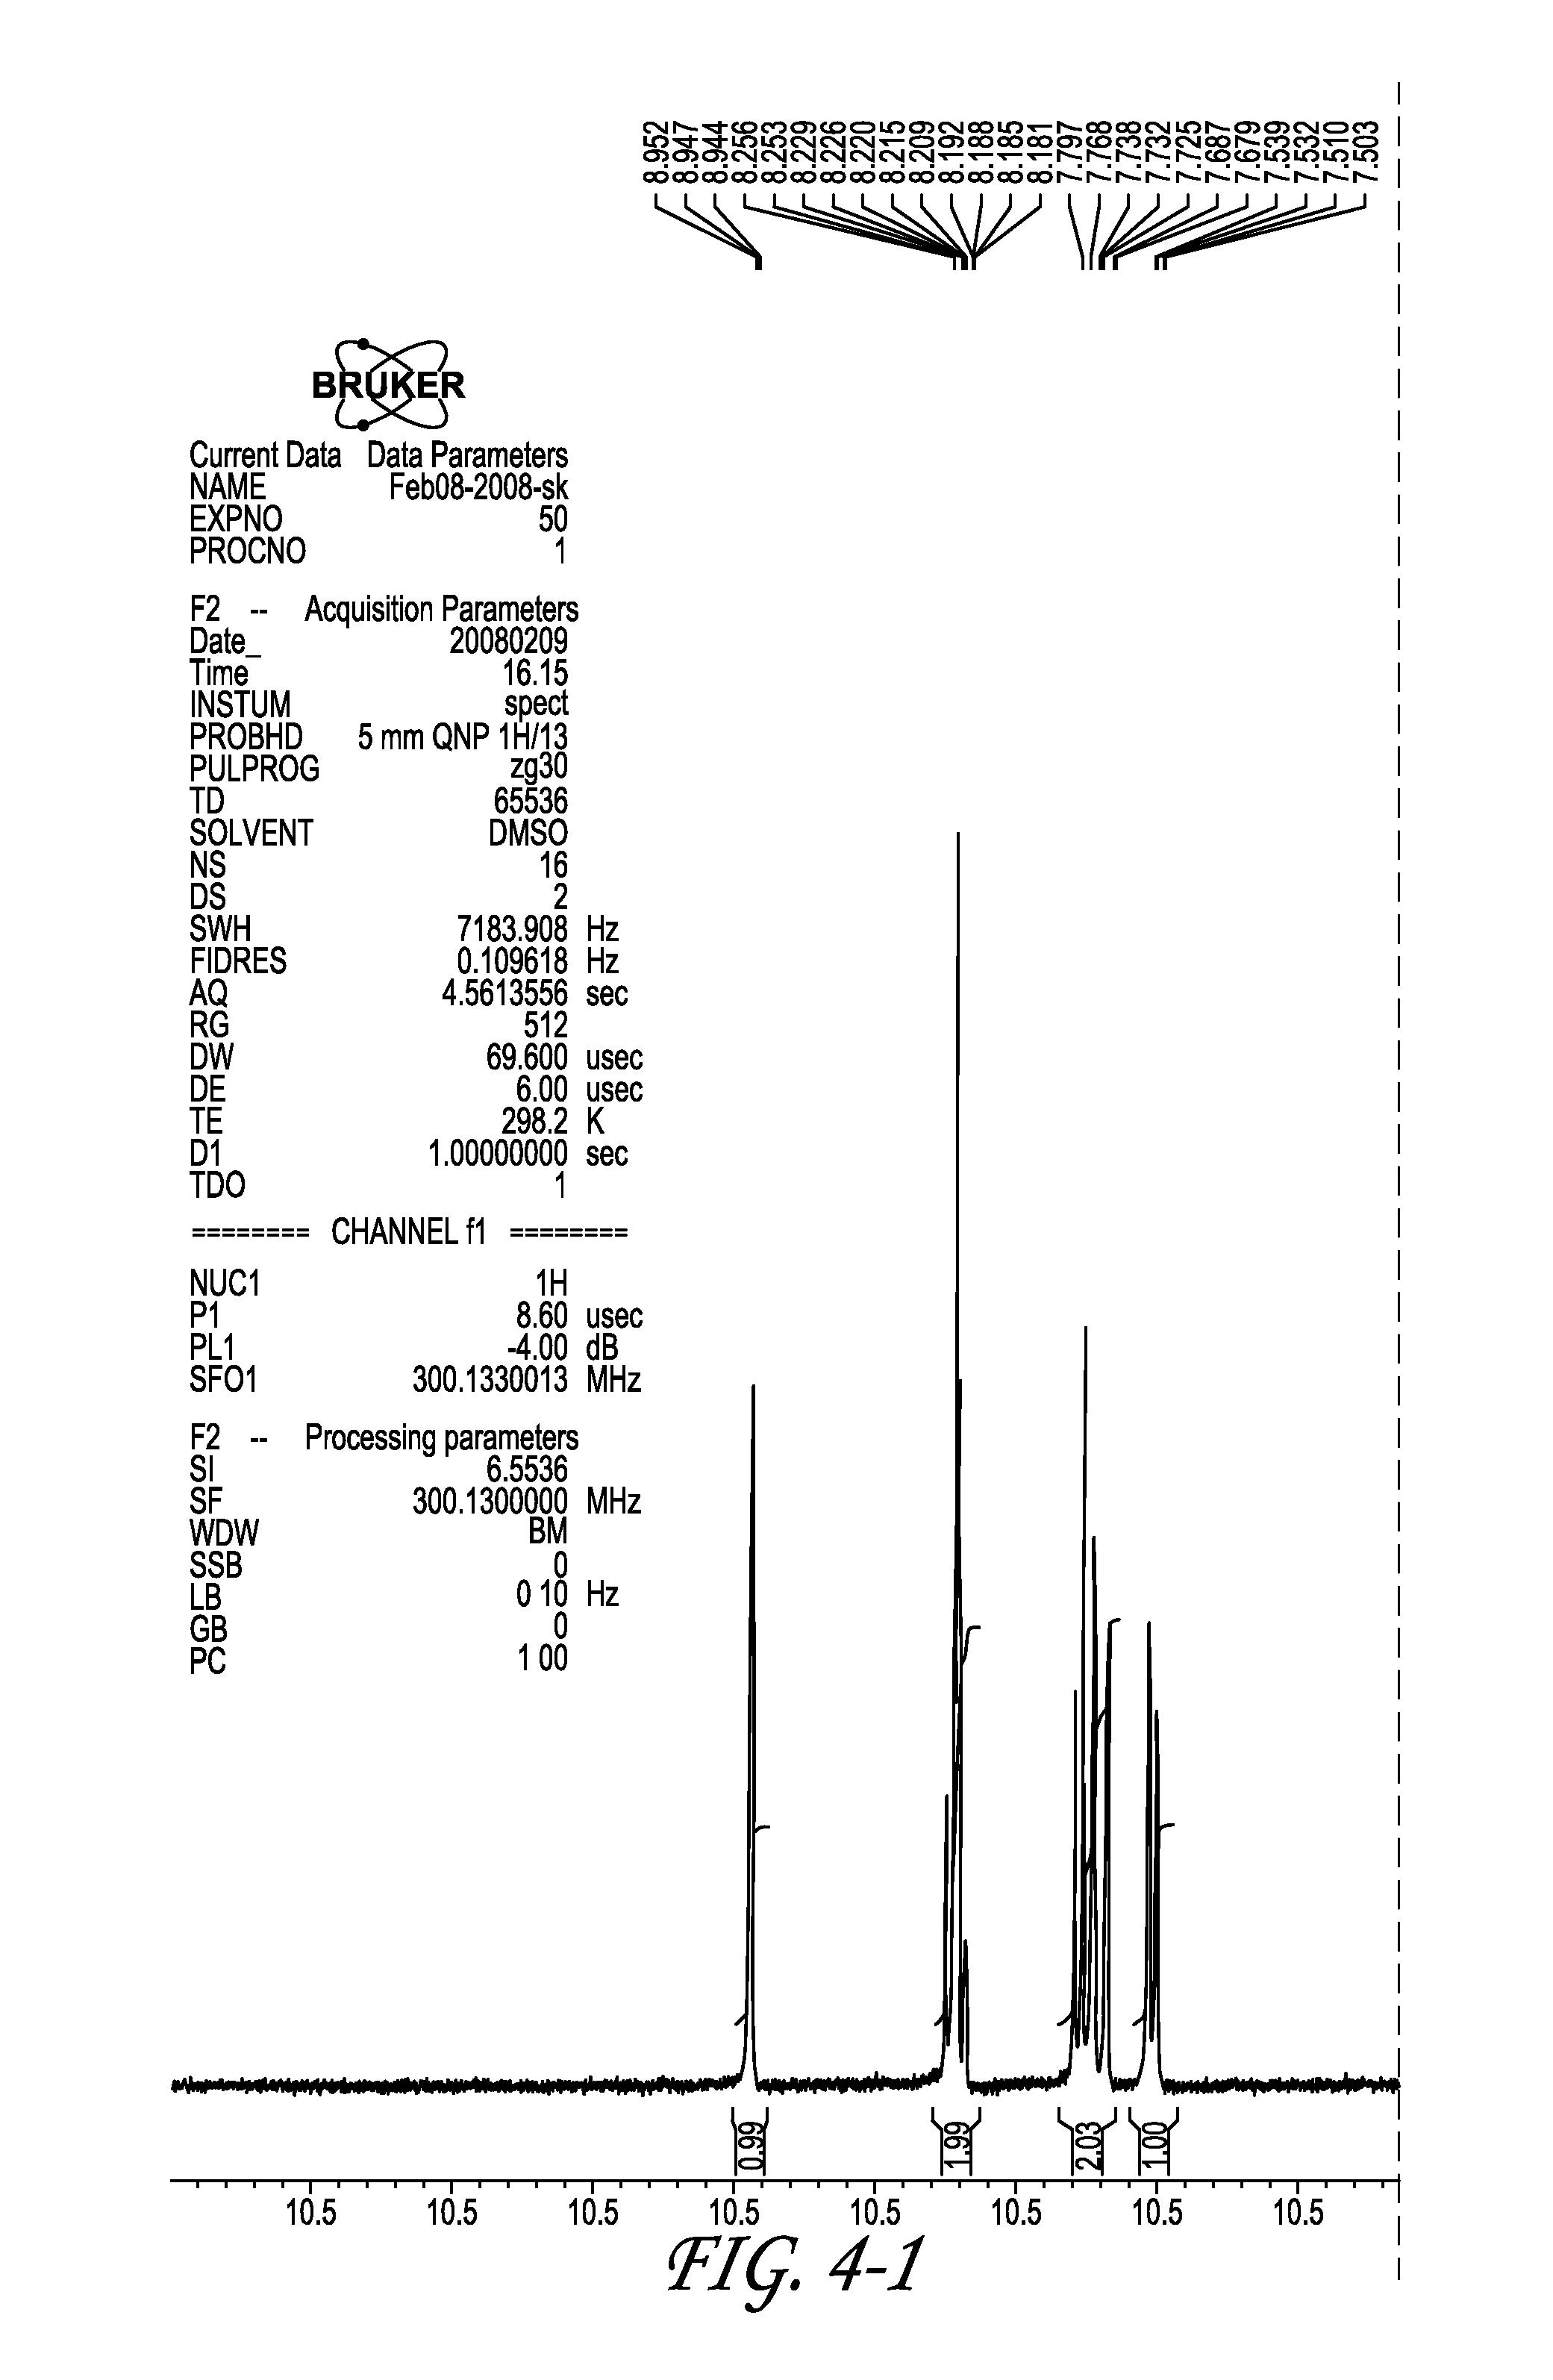 ftir spectrometer diagram 480v 3 phase motor wiring tr 700 701fa tedizolid phosphate  new drug approvals